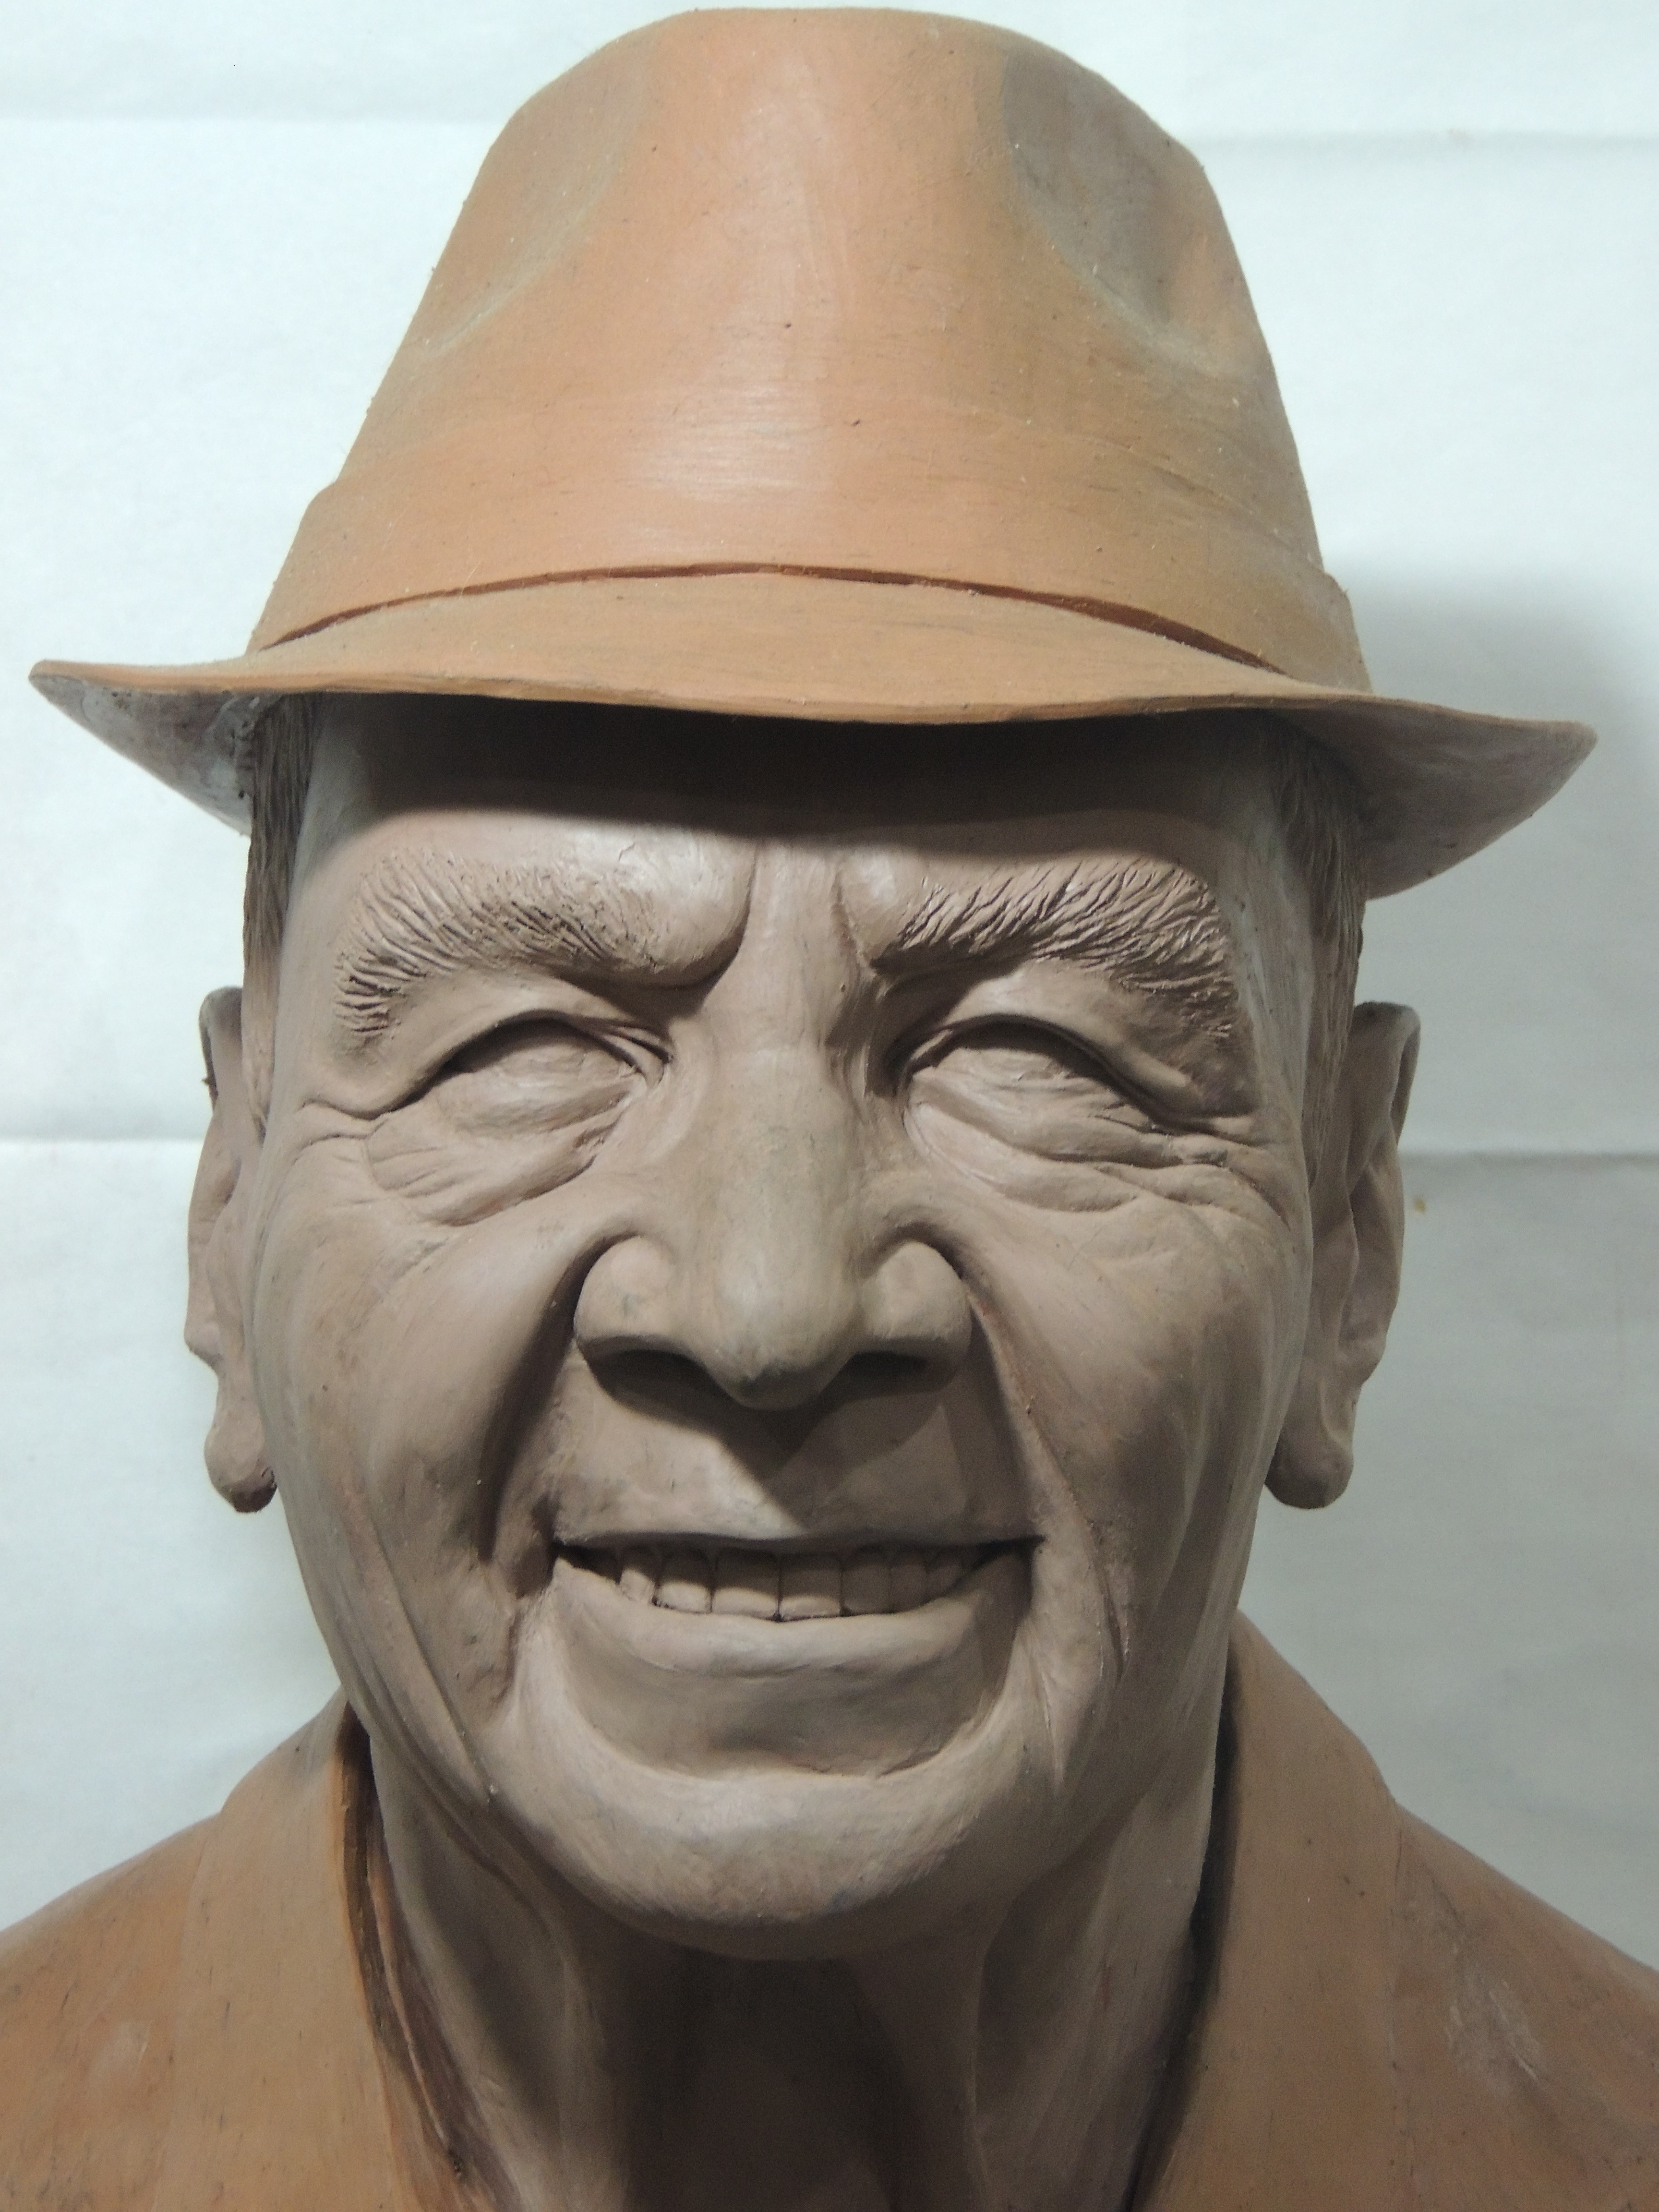 c23950b95 Veja como será o busto do compositor Monarco